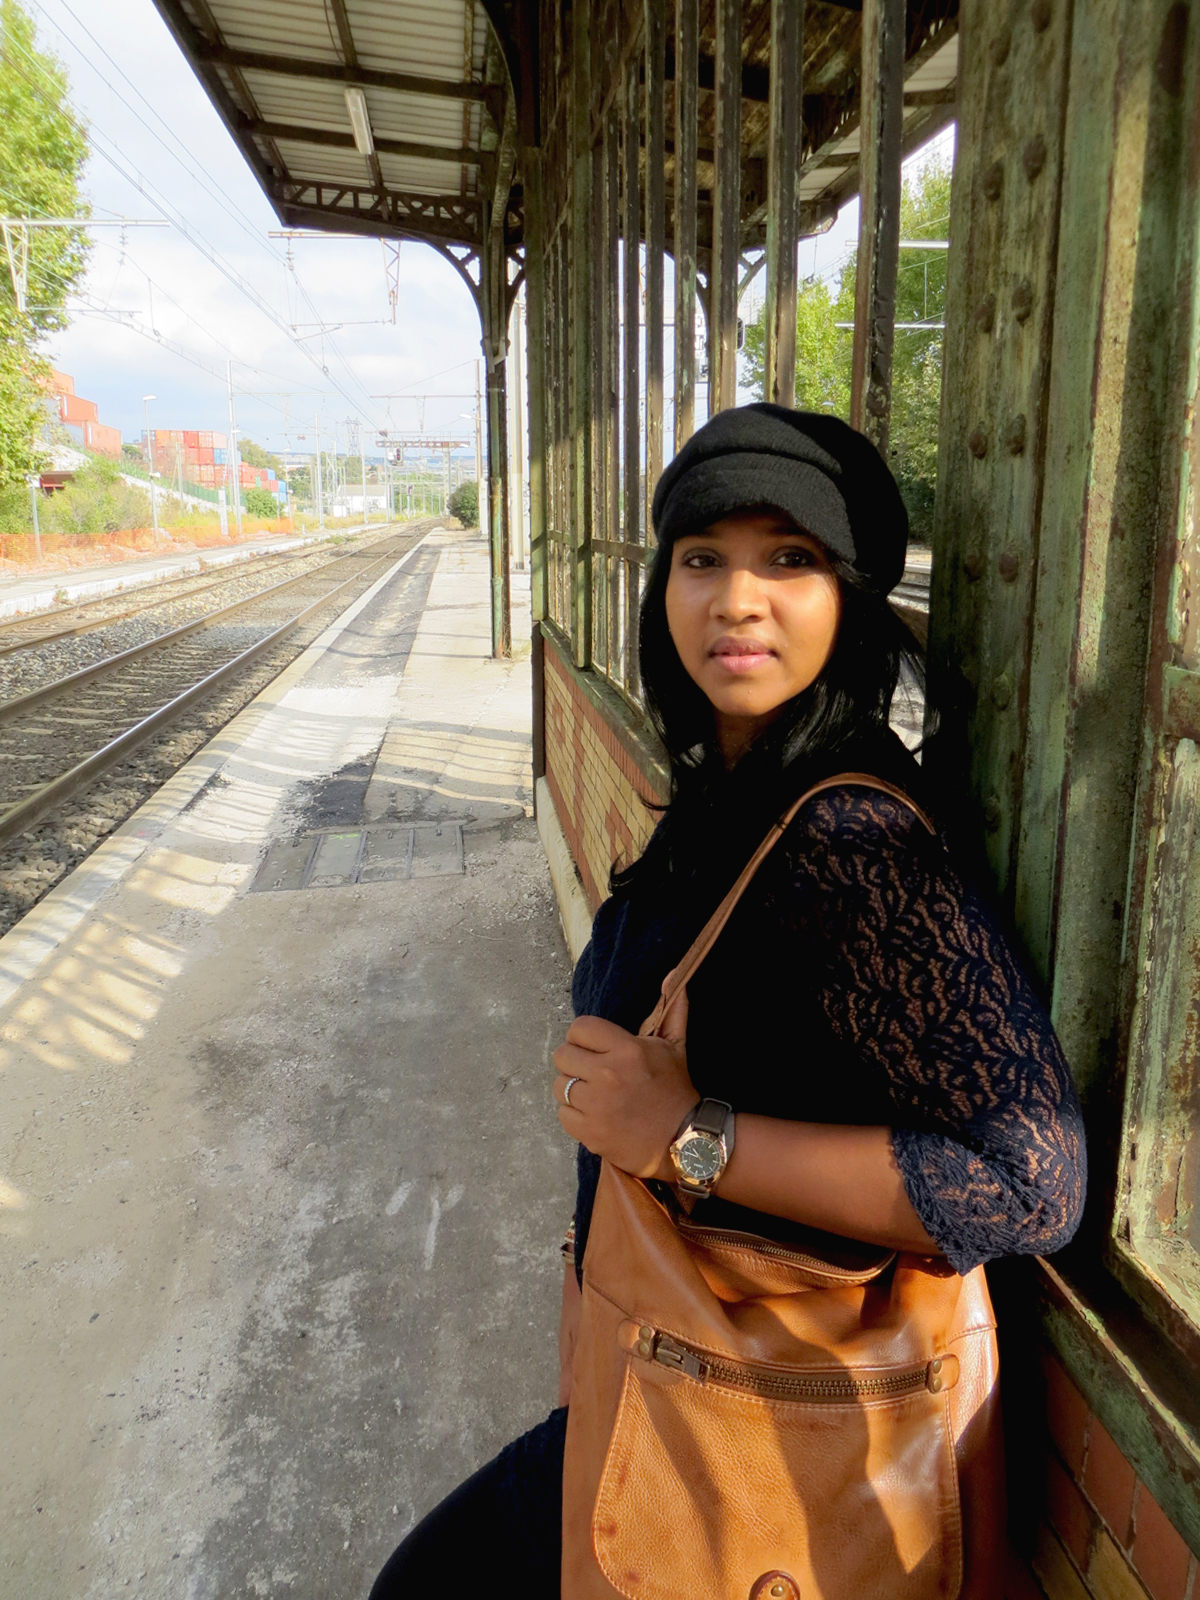 Hema_Waiting_for_the_train_C-Oui-Copenhague13